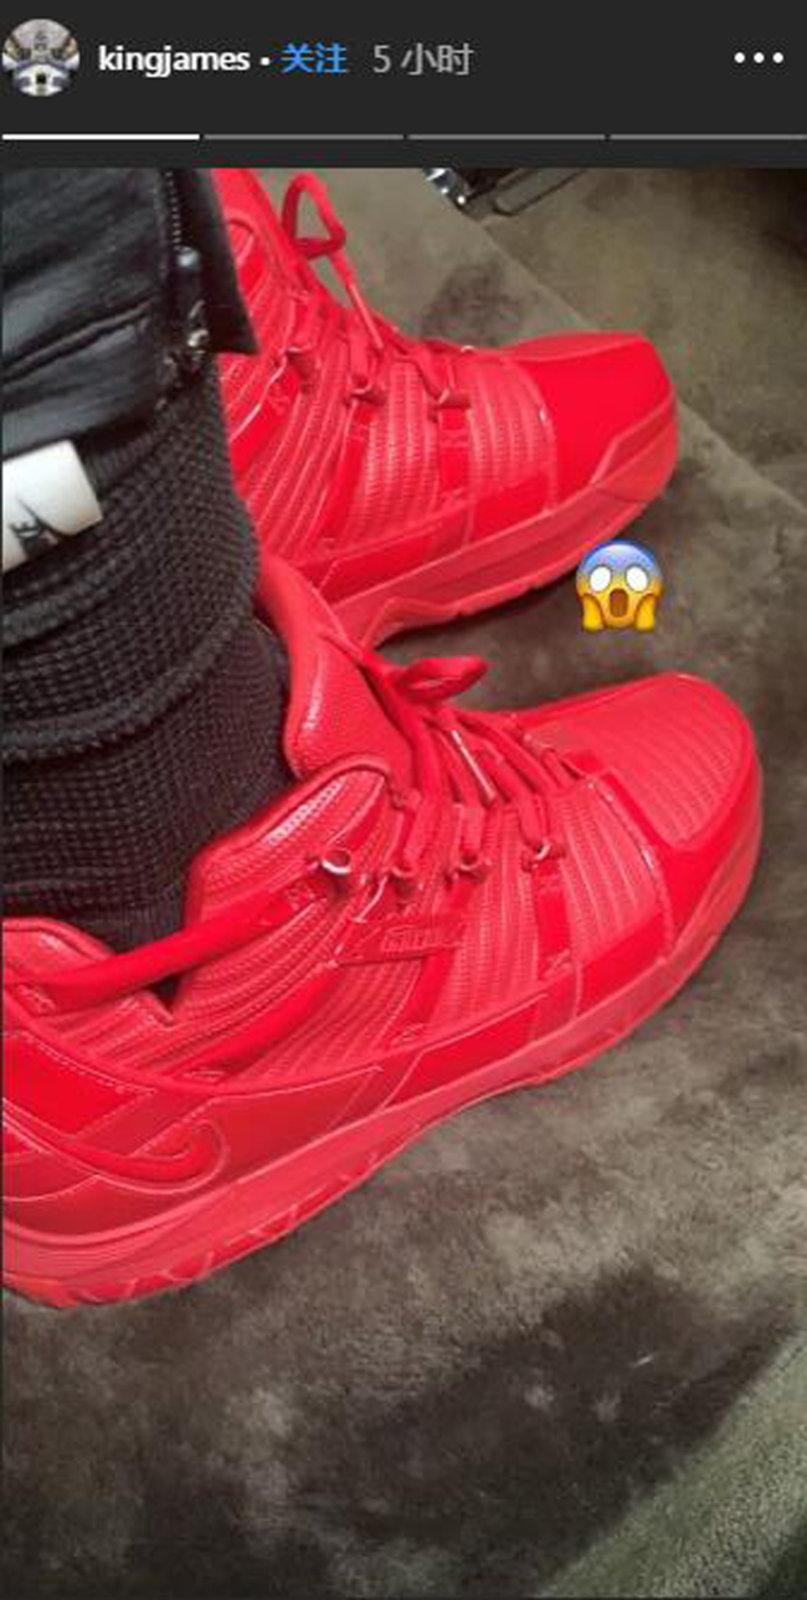 Nike,LeBron 3,曝光  詹皇亲晒新鞋!抢眼大红配色 LeBron 3 首度曝光!